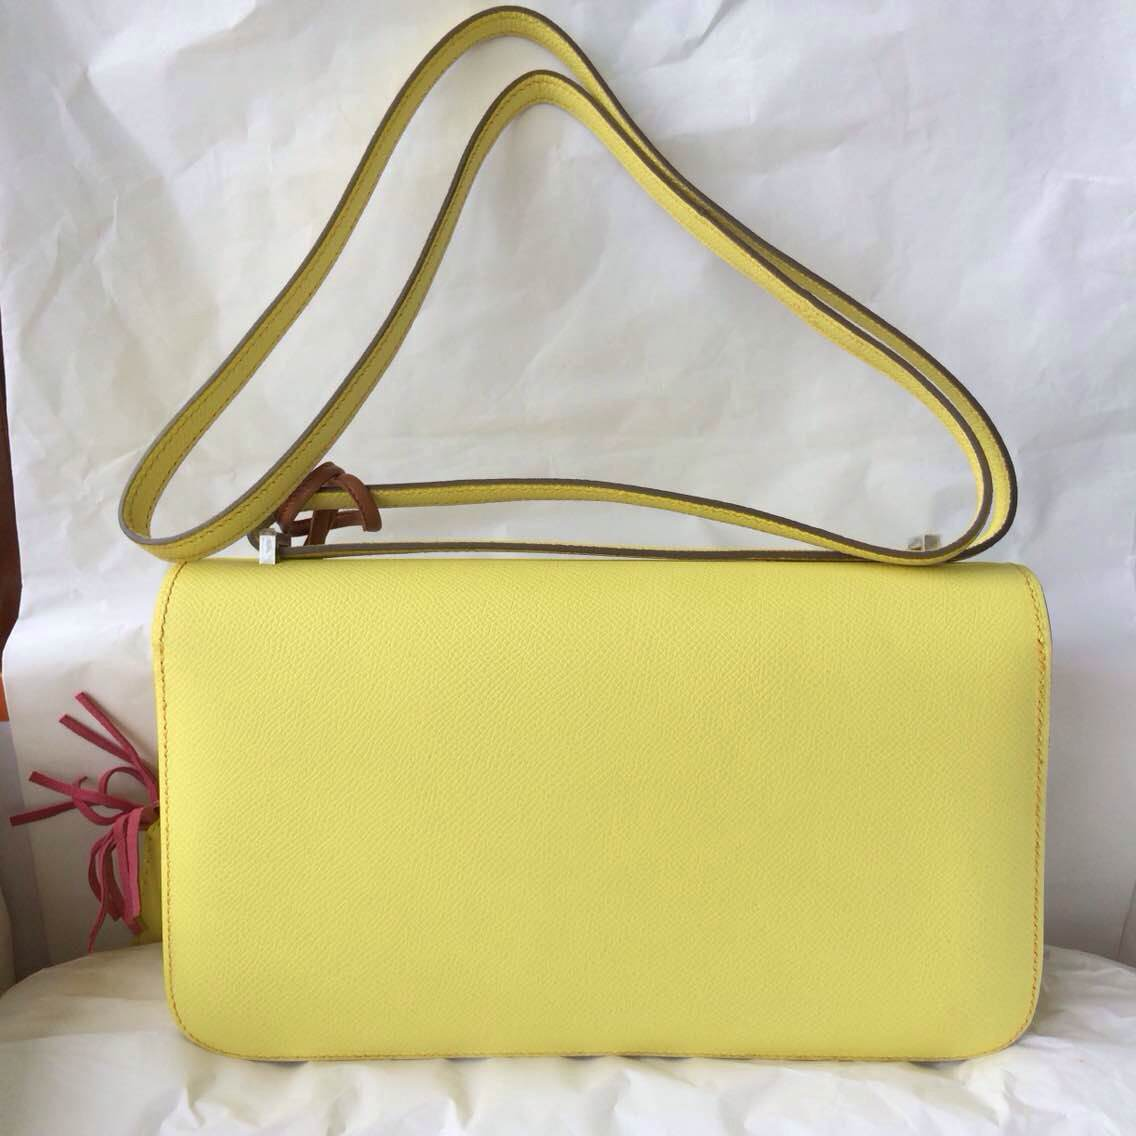 Discount Hermes Constance elan 26cm C9 Soufre Yellow Epsom Leather Shoulder Bag